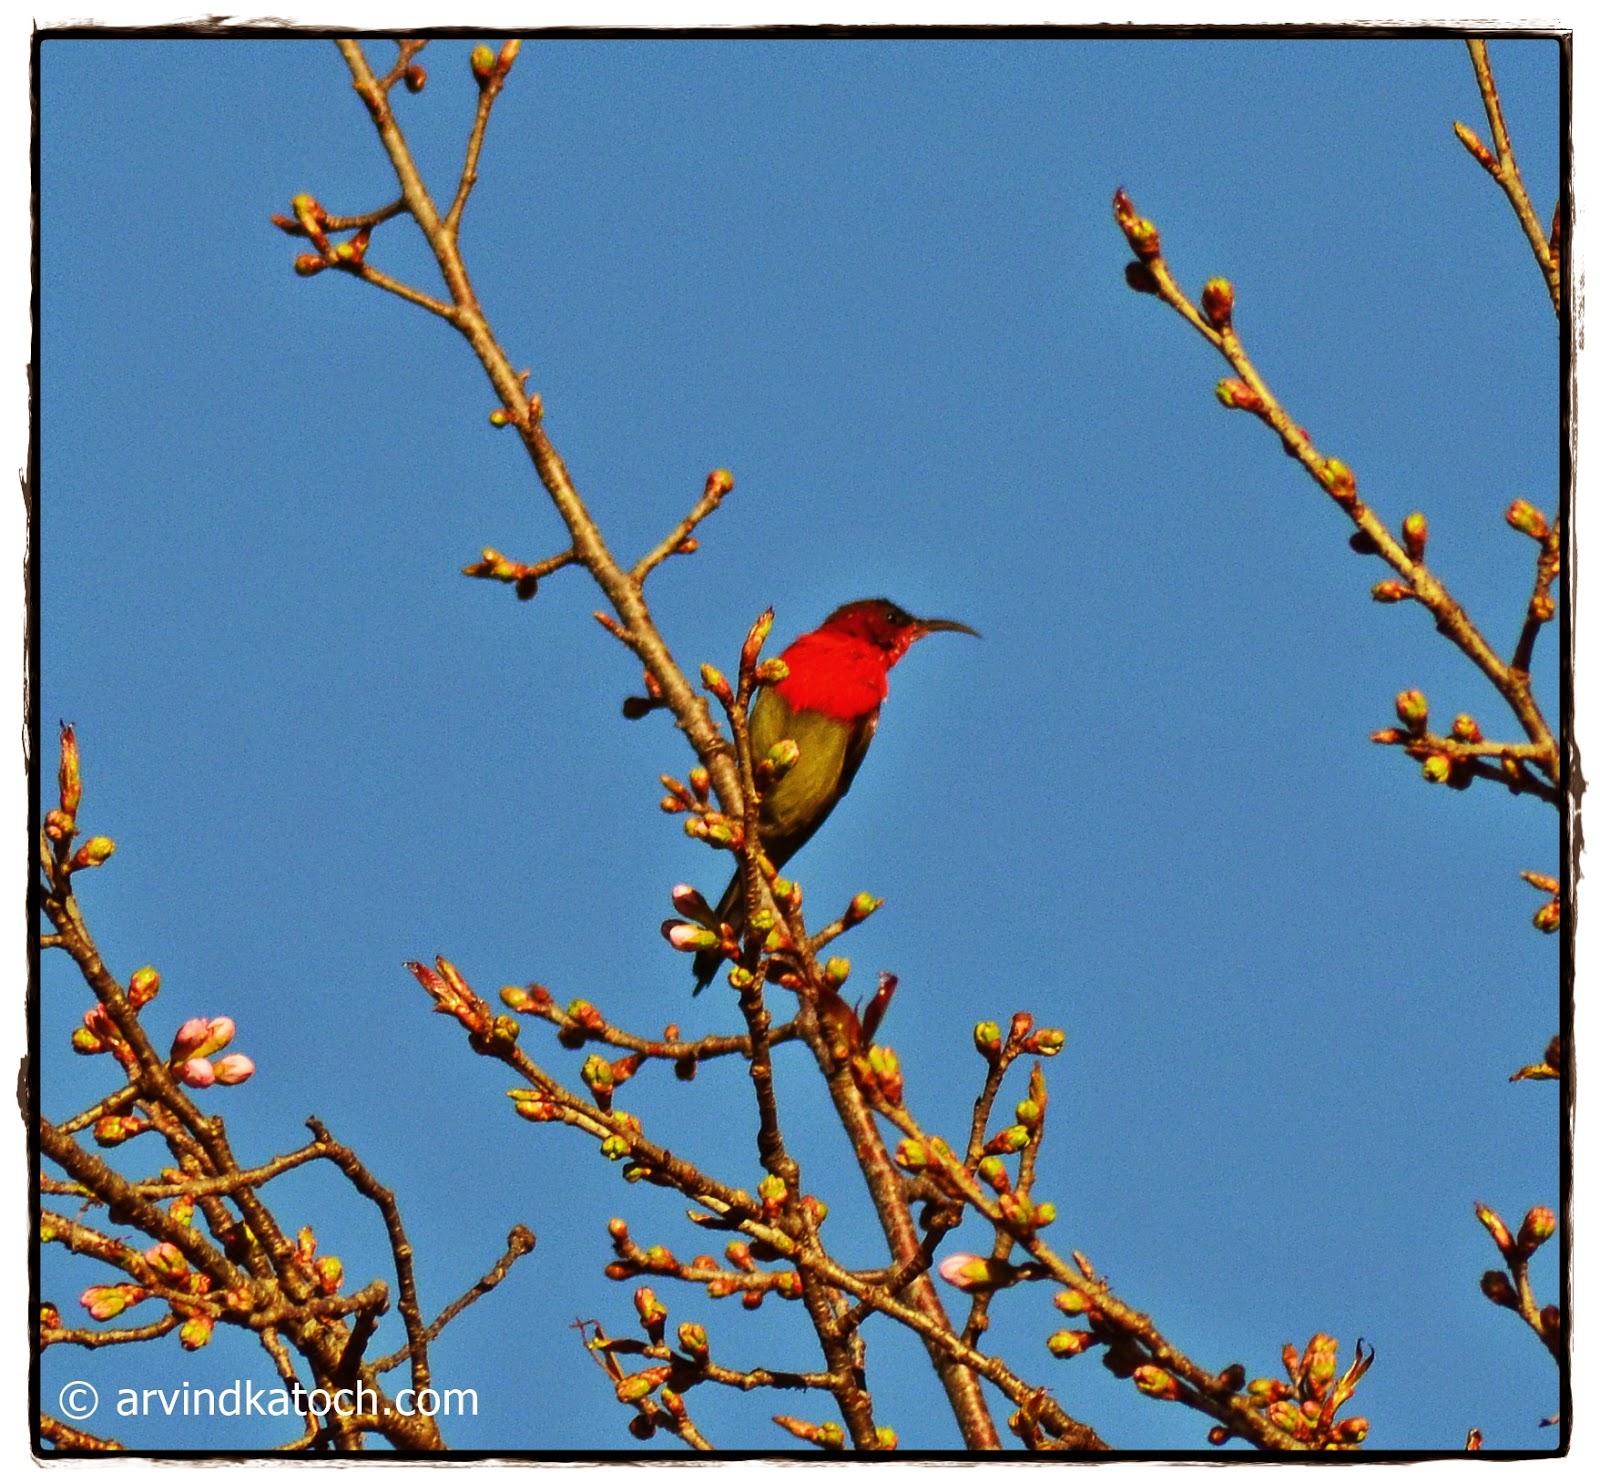 Tree, Branch, Sunbird, Crimson Sunbird